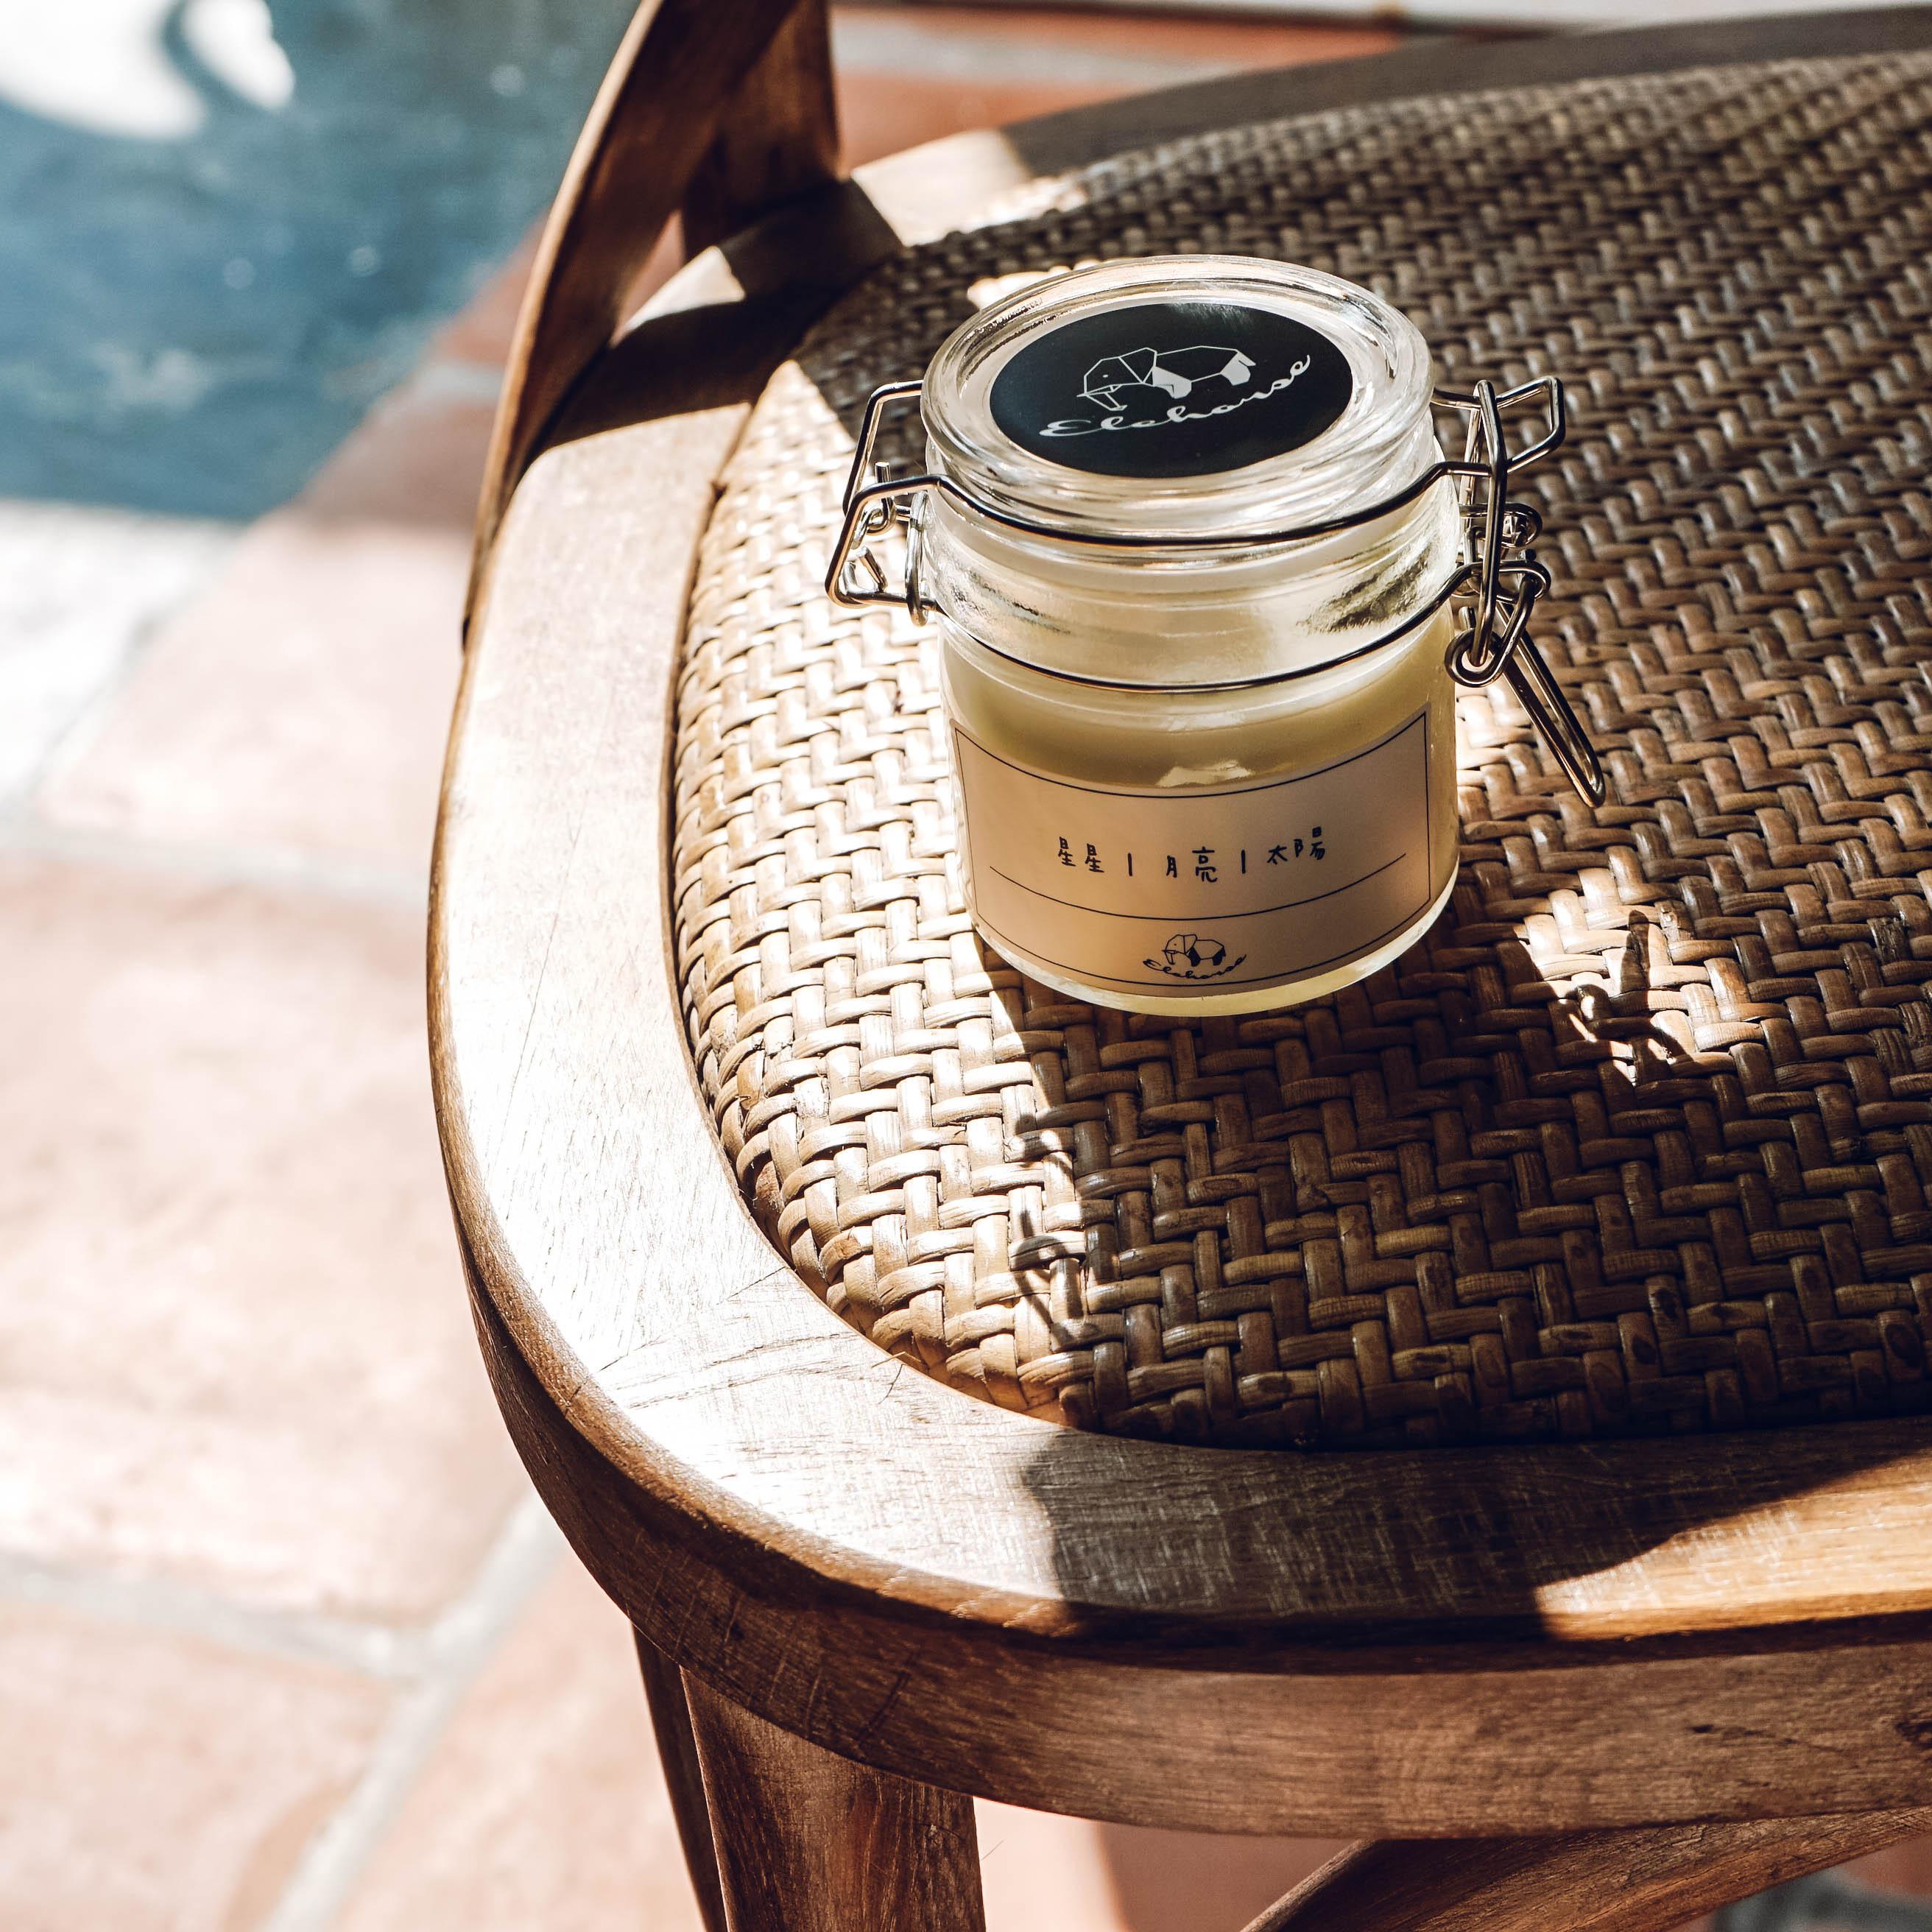 ElehorseStudio香薰蜡烛旅行装,送朋友摆件伴手礼礼物